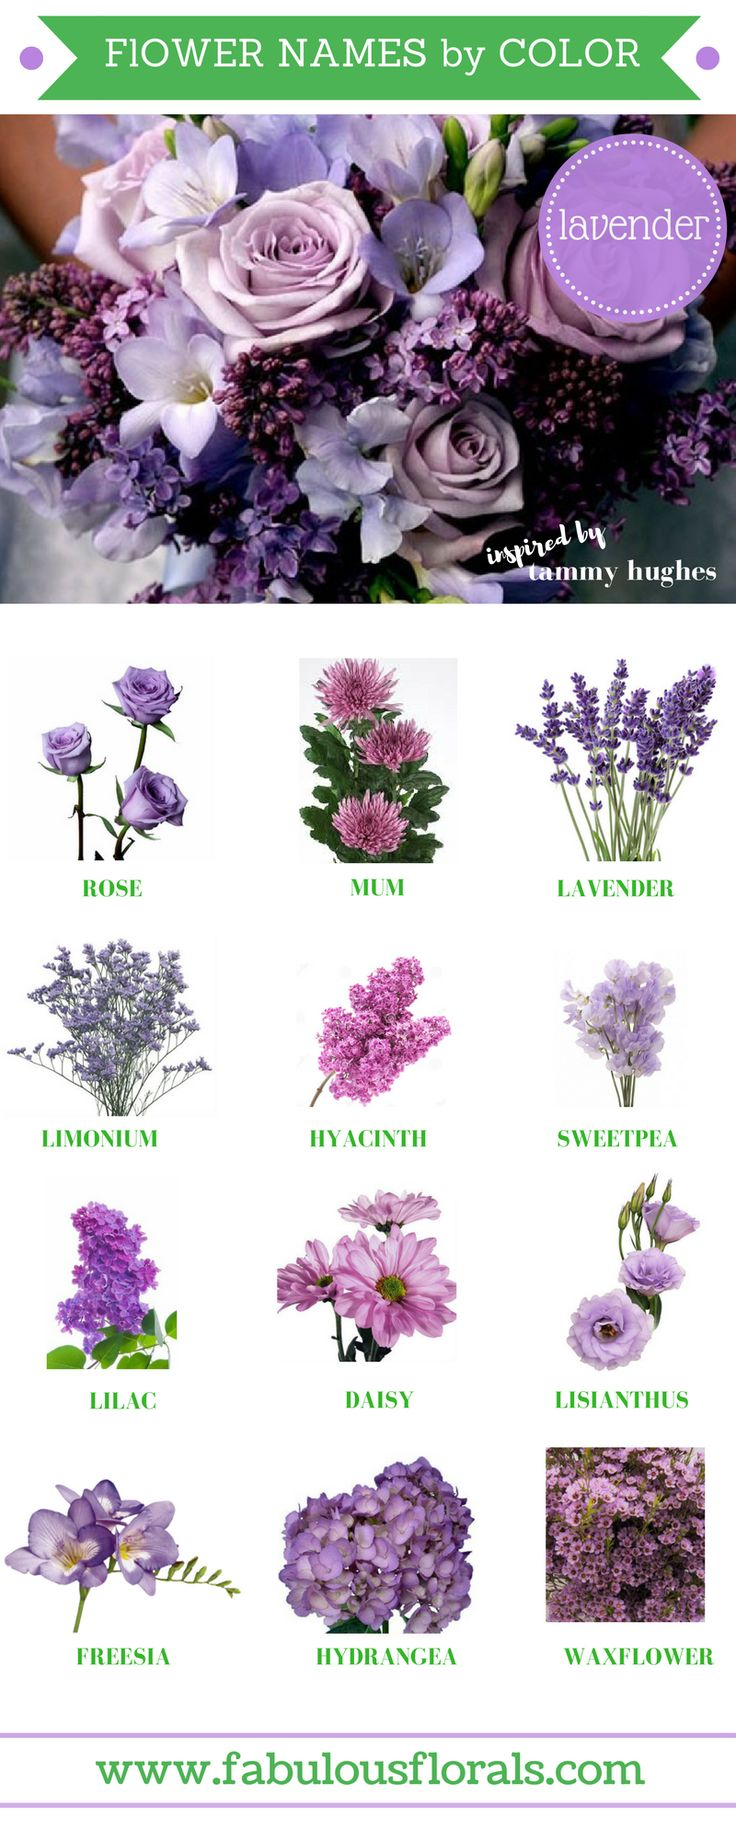 Purples How To DIY Wedding Flowers! 2018 Wedding Flower Trends. www.howtodiyweddingflowers.com Easy DIY Tutorials and How to Tips & Tricks! #diywedding #diyflowers #howtomakeabouquet www.howtodiyweddingflowers.com